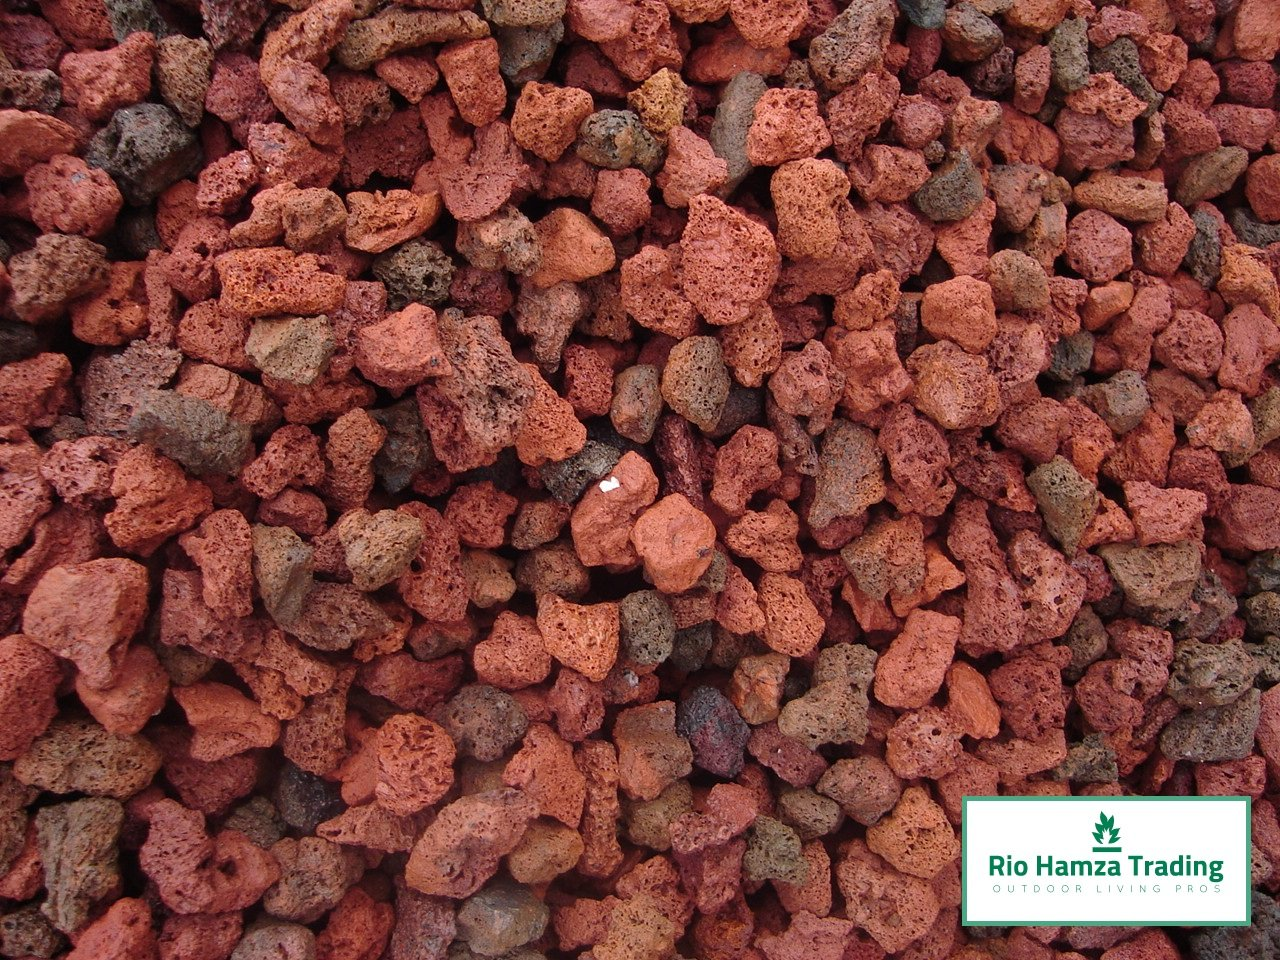 Rio Hamza Trading Red Lava Rocks (12-lbs) All Natural Medium Size Lava Rocks 1''-2'' Size Rocks